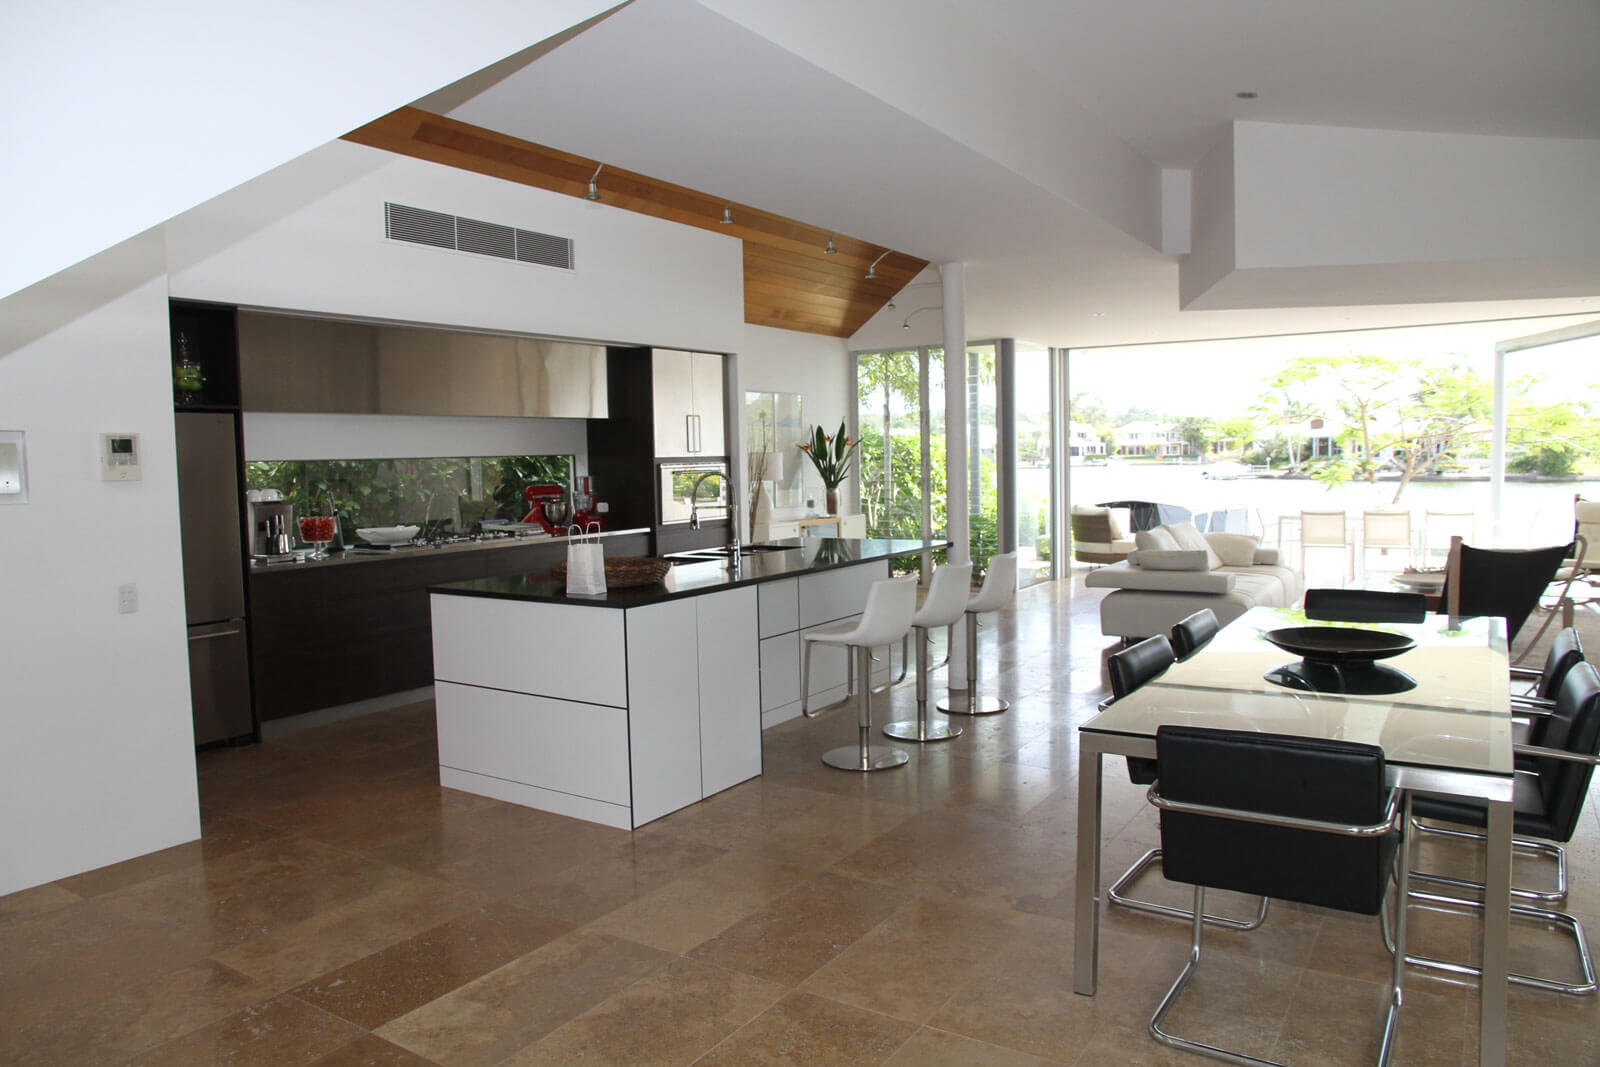 Bauhaus stílus étkező